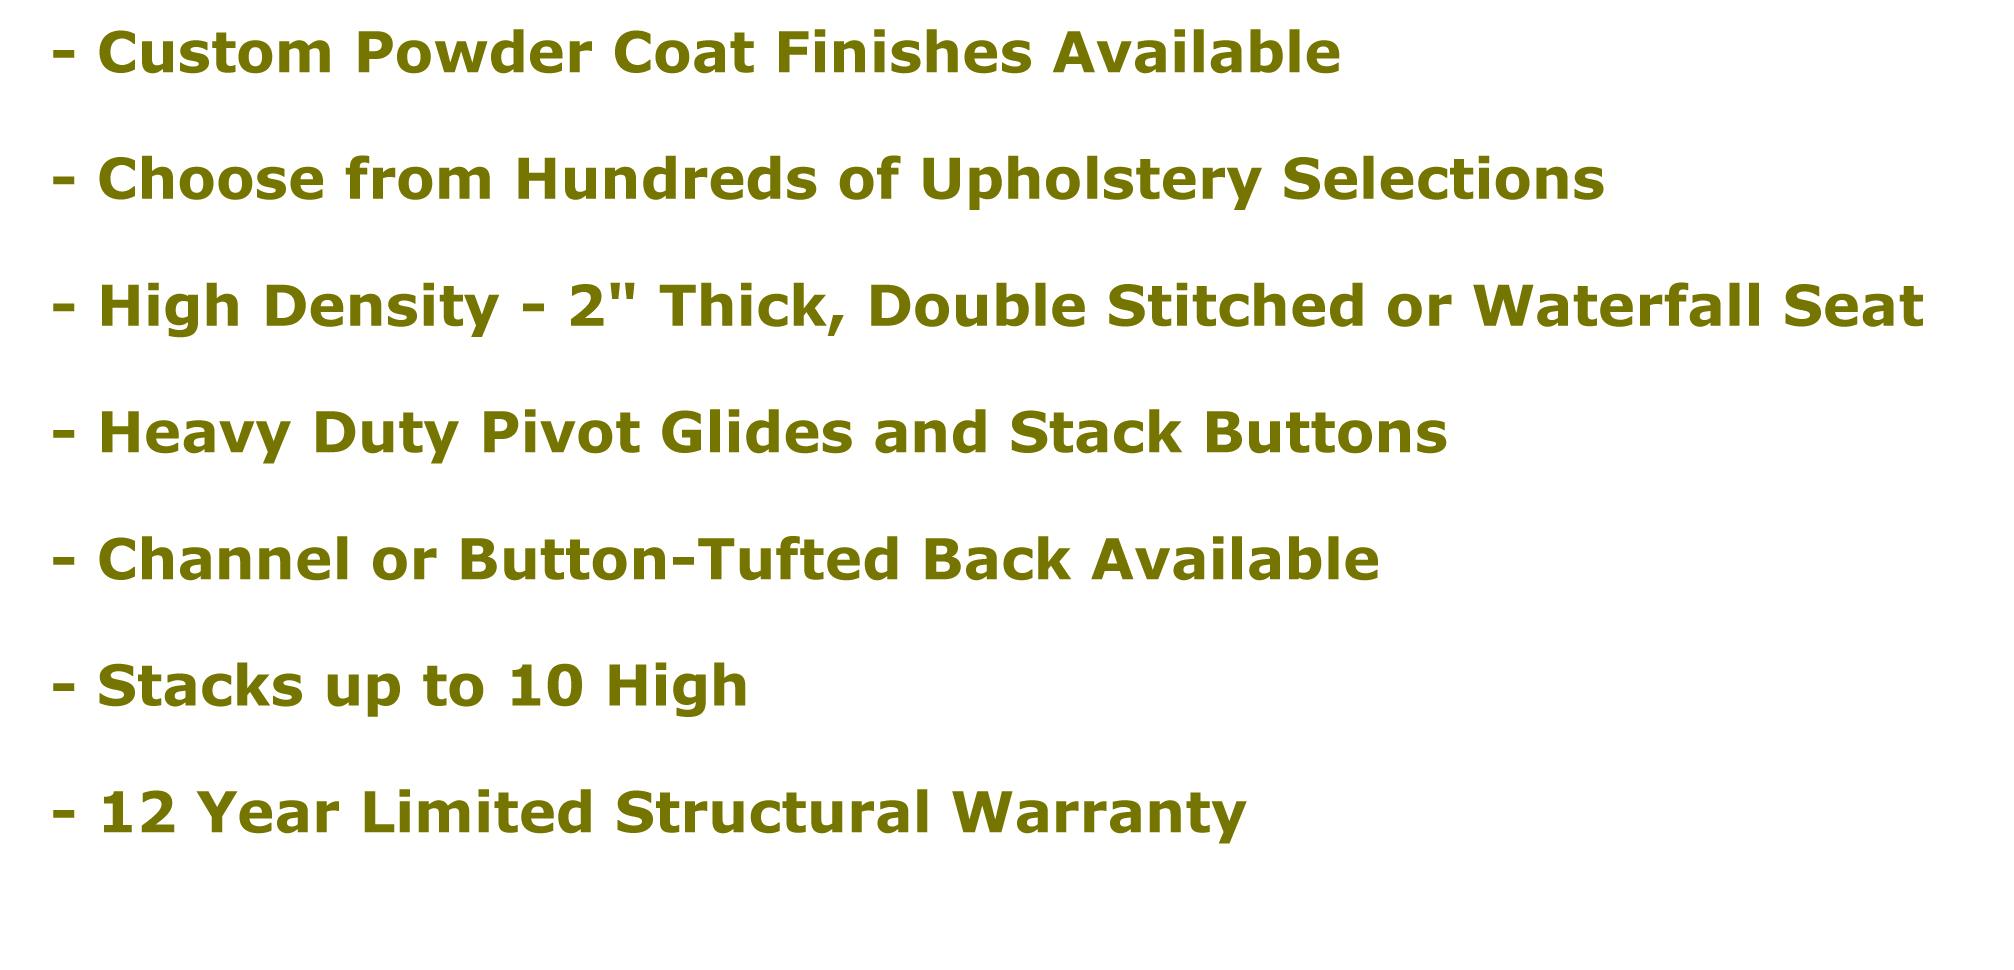 custom-powder-coat-finishes-available2.jpg